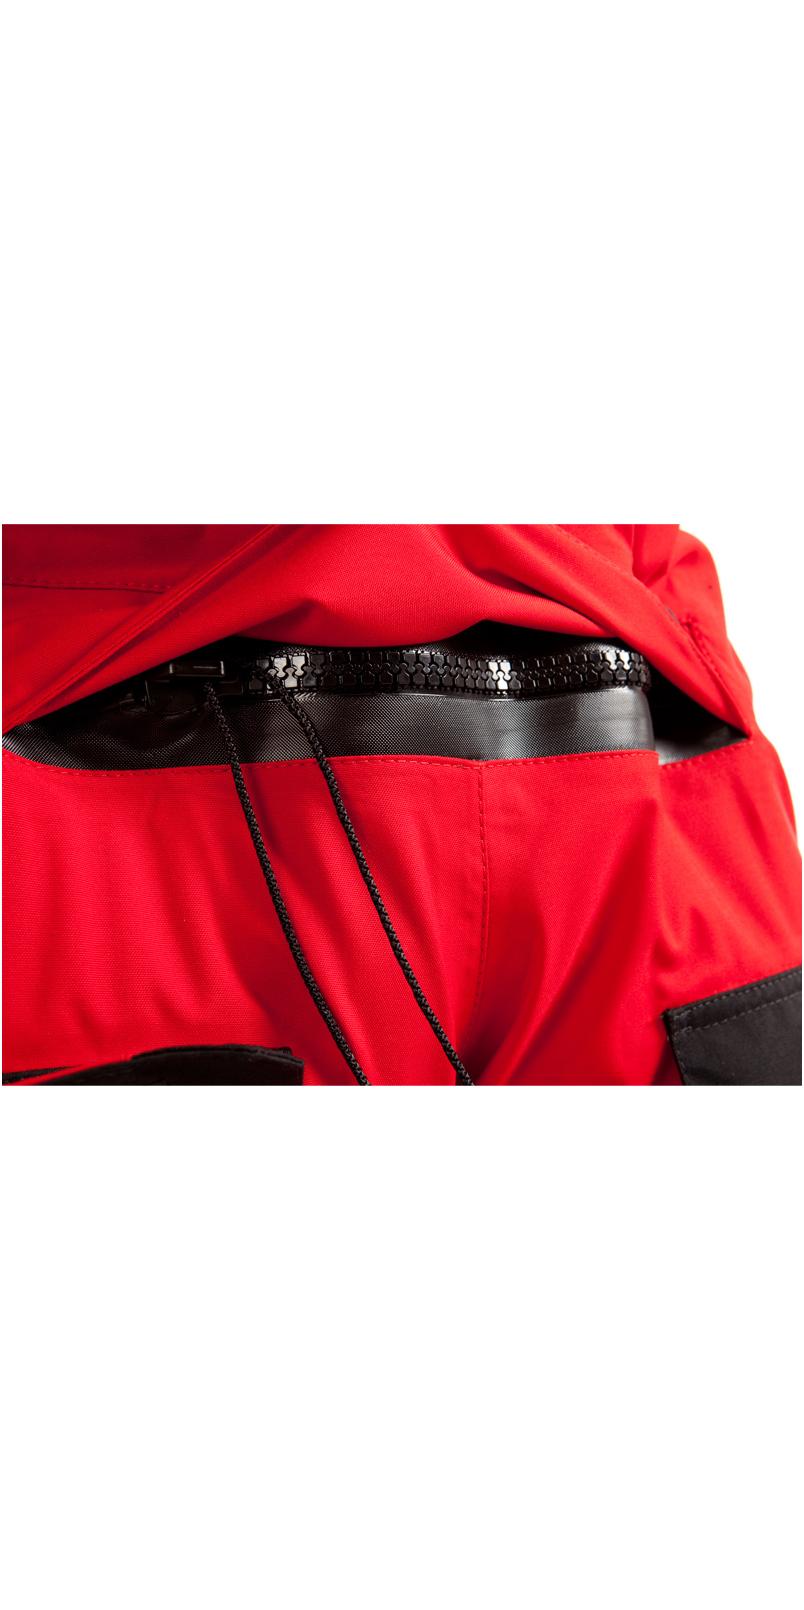 2019 Typhoon PS330 Xtreme Kayak / Ocean Sailing Drysuit + Con Zip Black / Red 100151